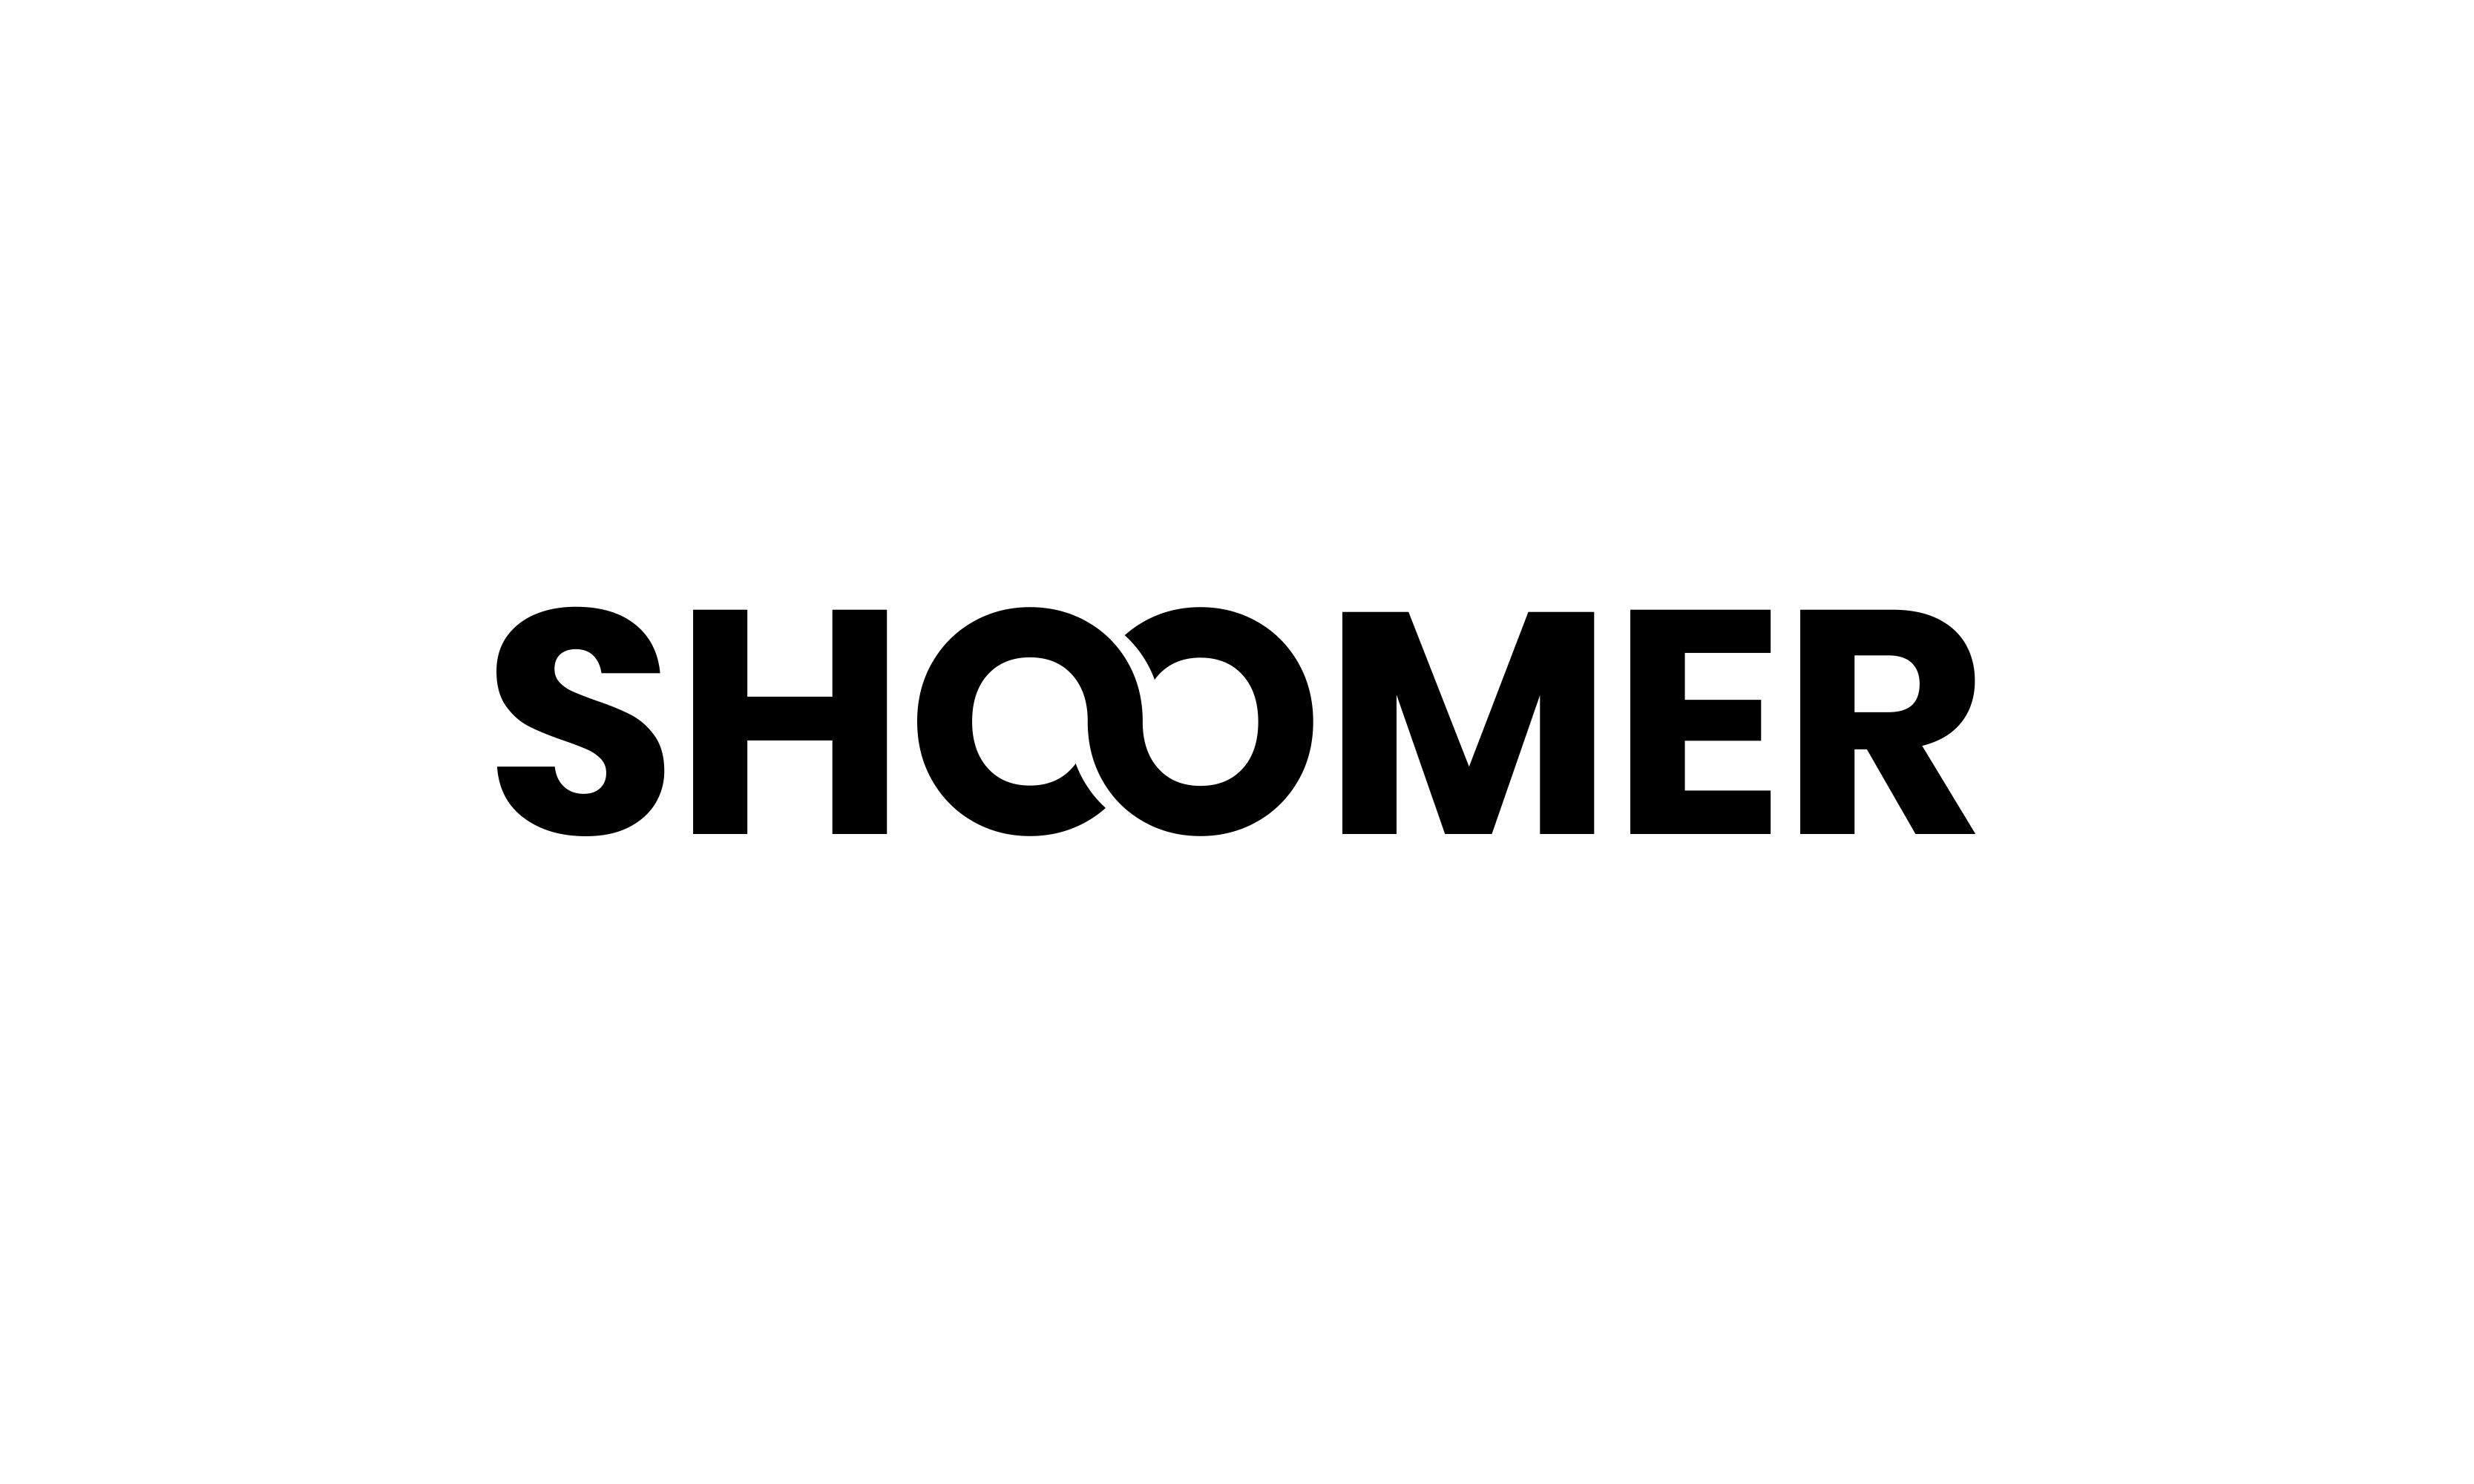 Shoomer - E-commerce company name for sale